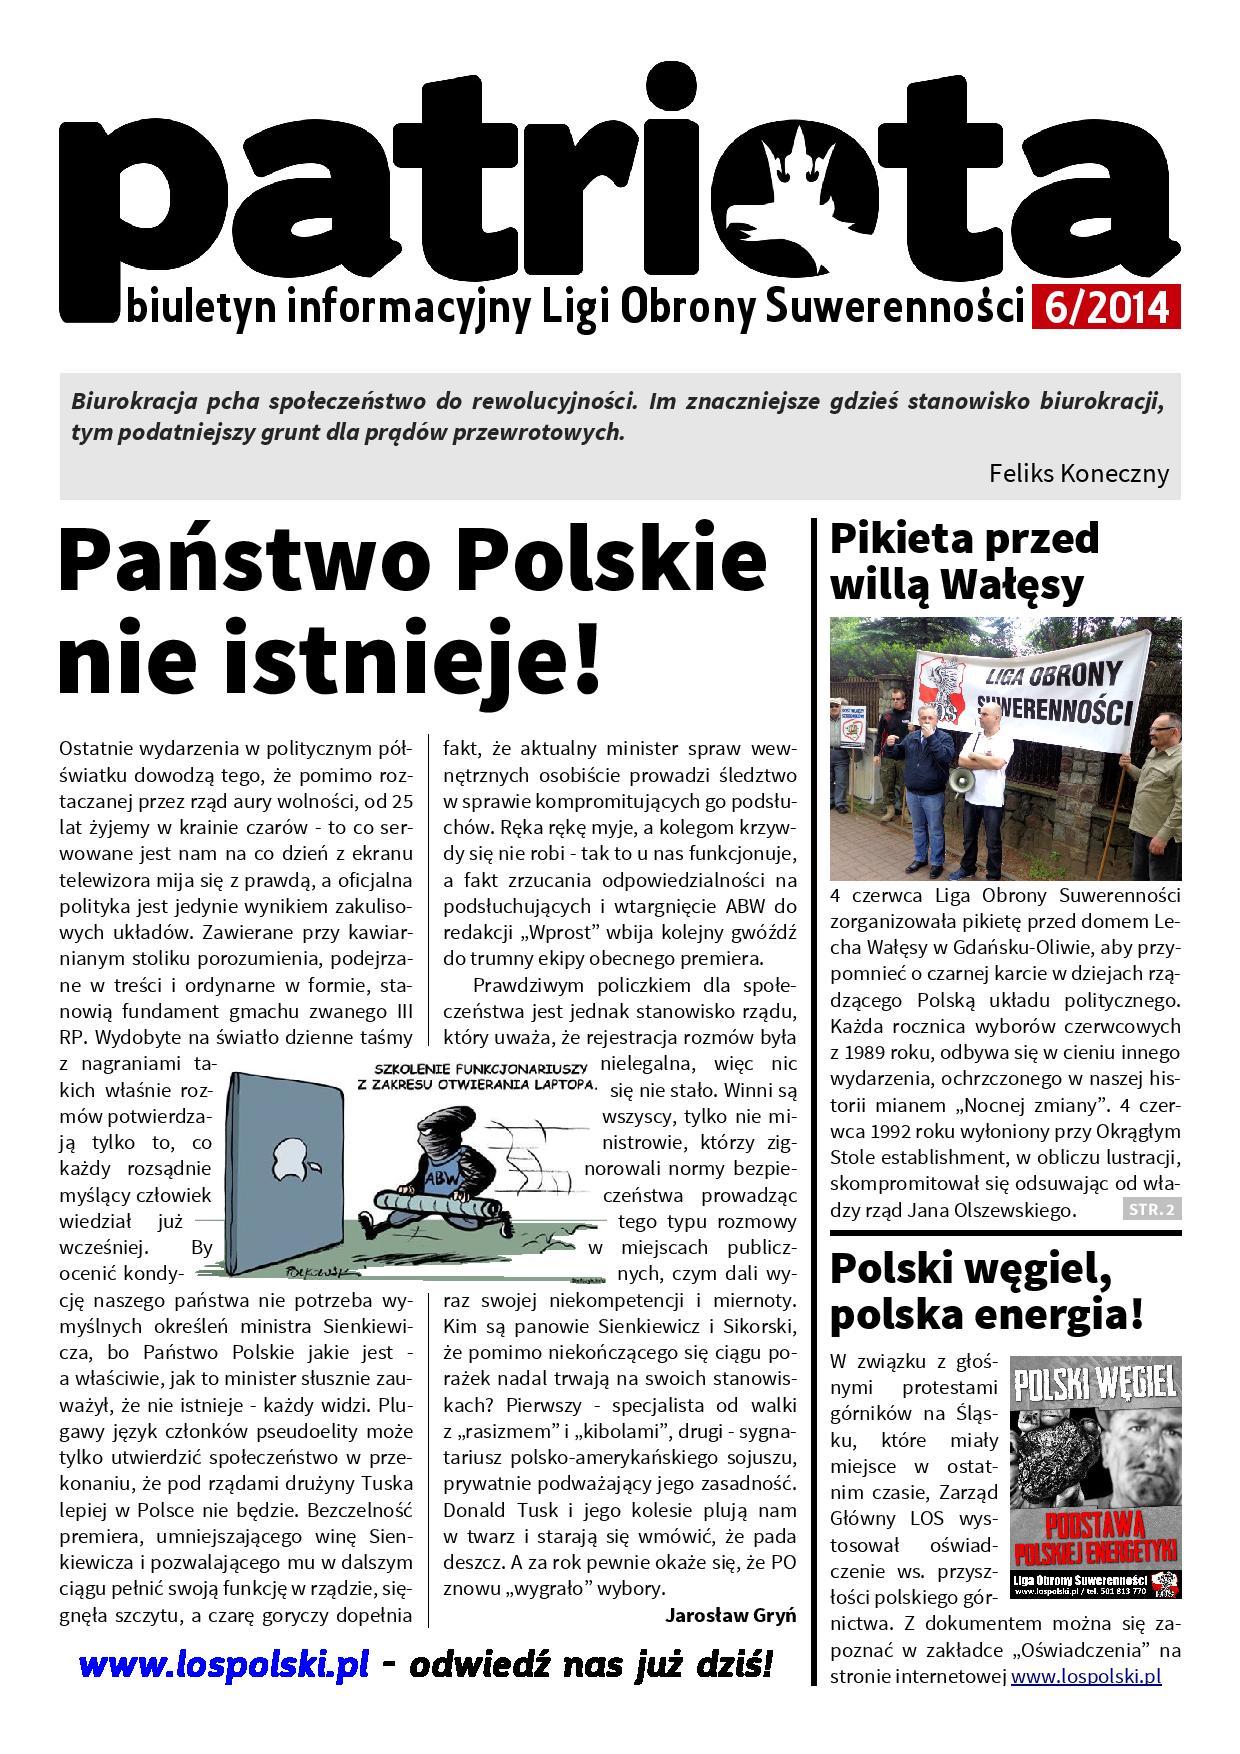 Patriota 06/2014